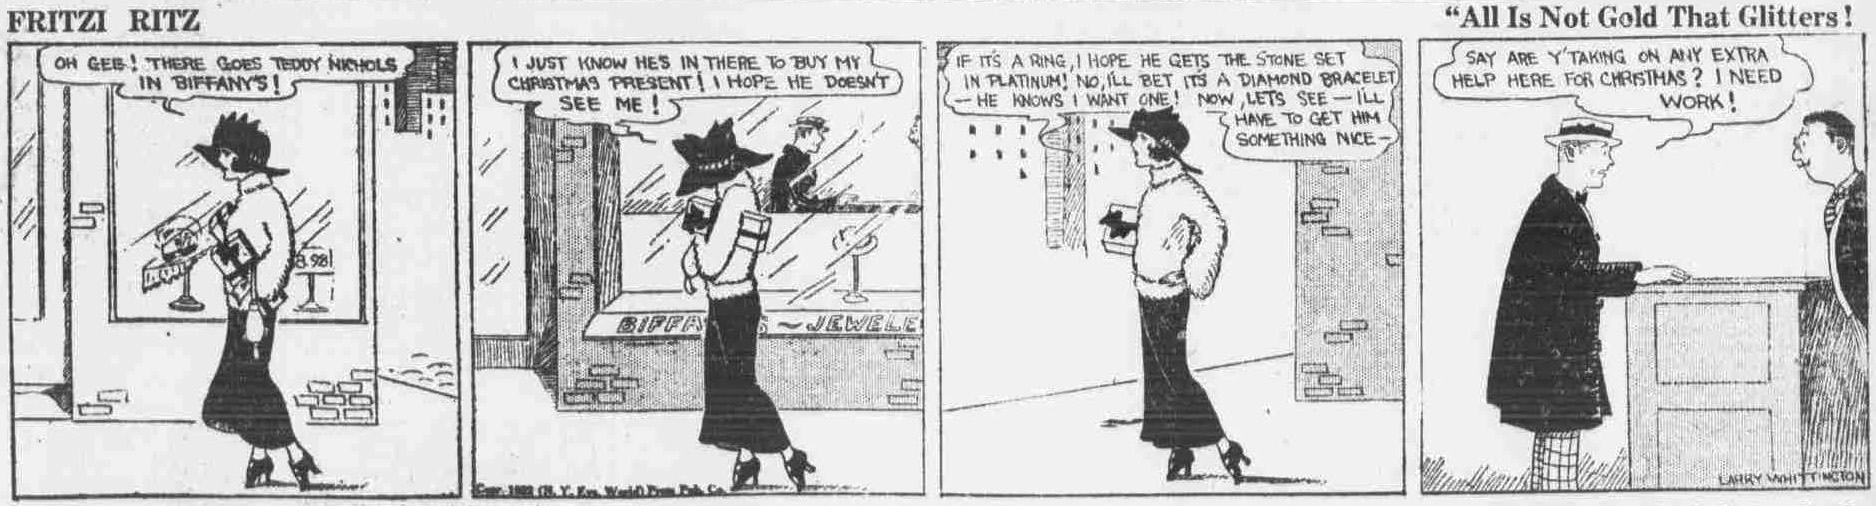 Dec. 18, 1922